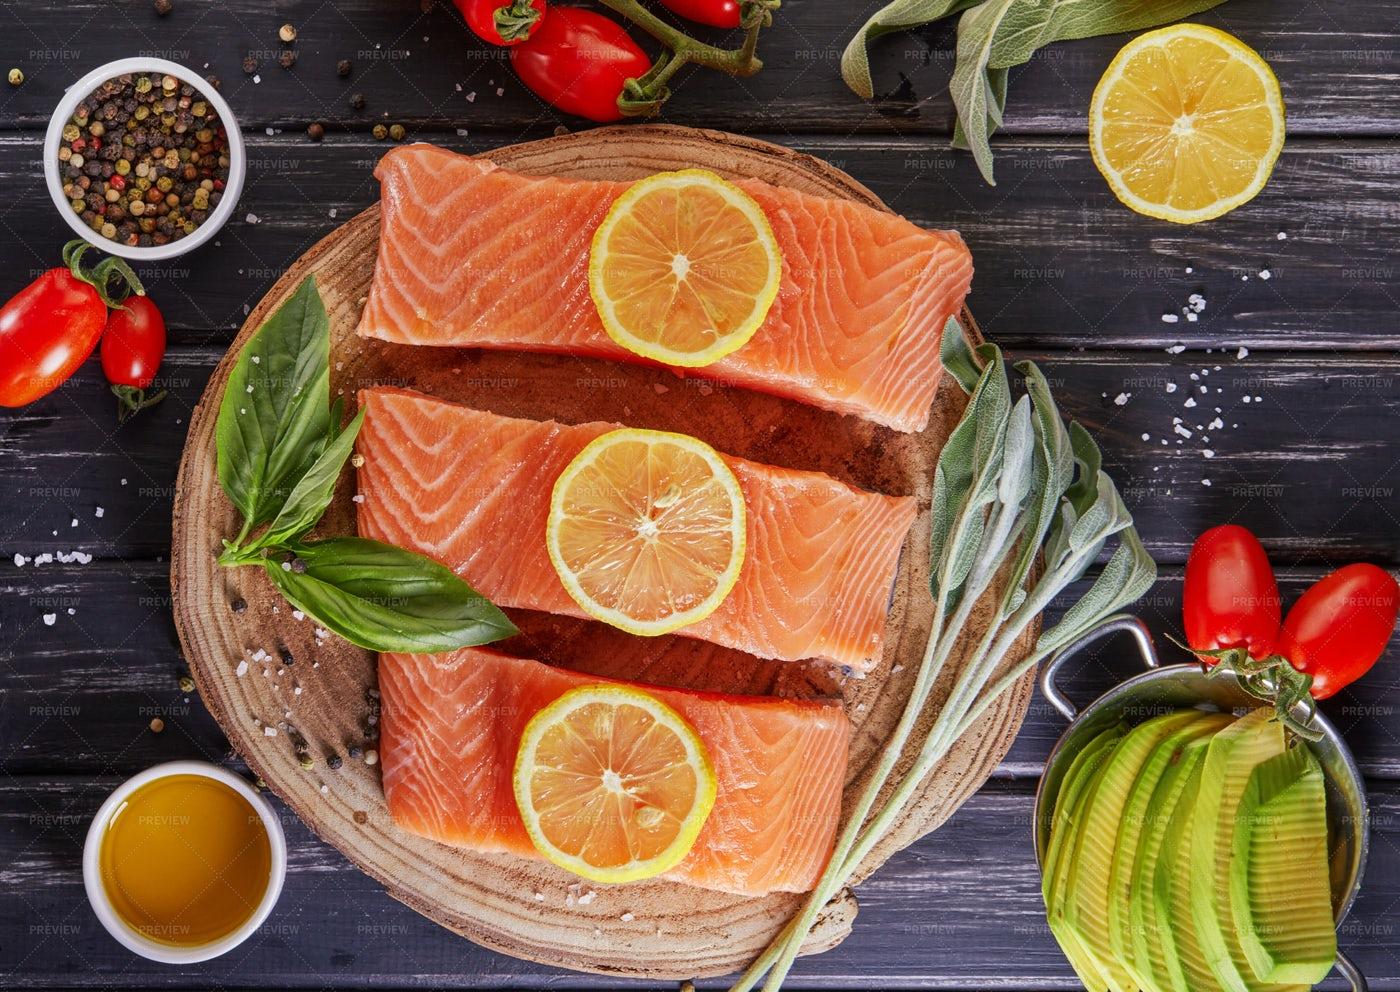 Raw Salmon Fillet Sliced: Stock Photos